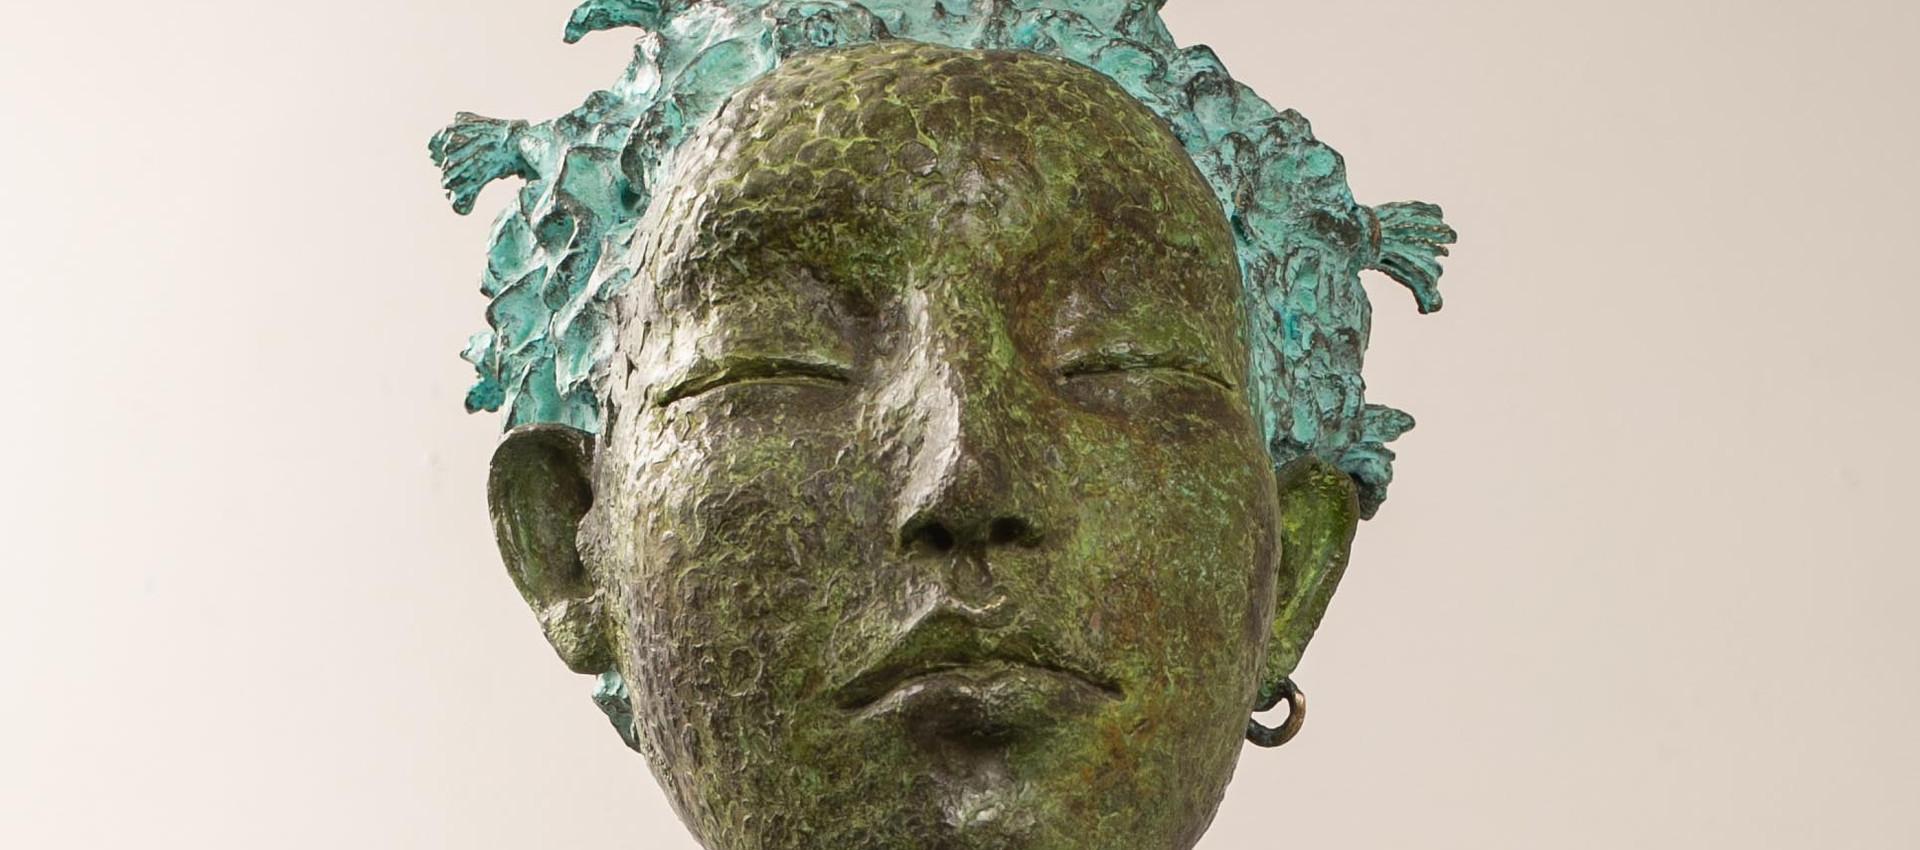 Alina Bachurina. Gnossienne VІ, 2020, bronze, stone, 64х24 cm